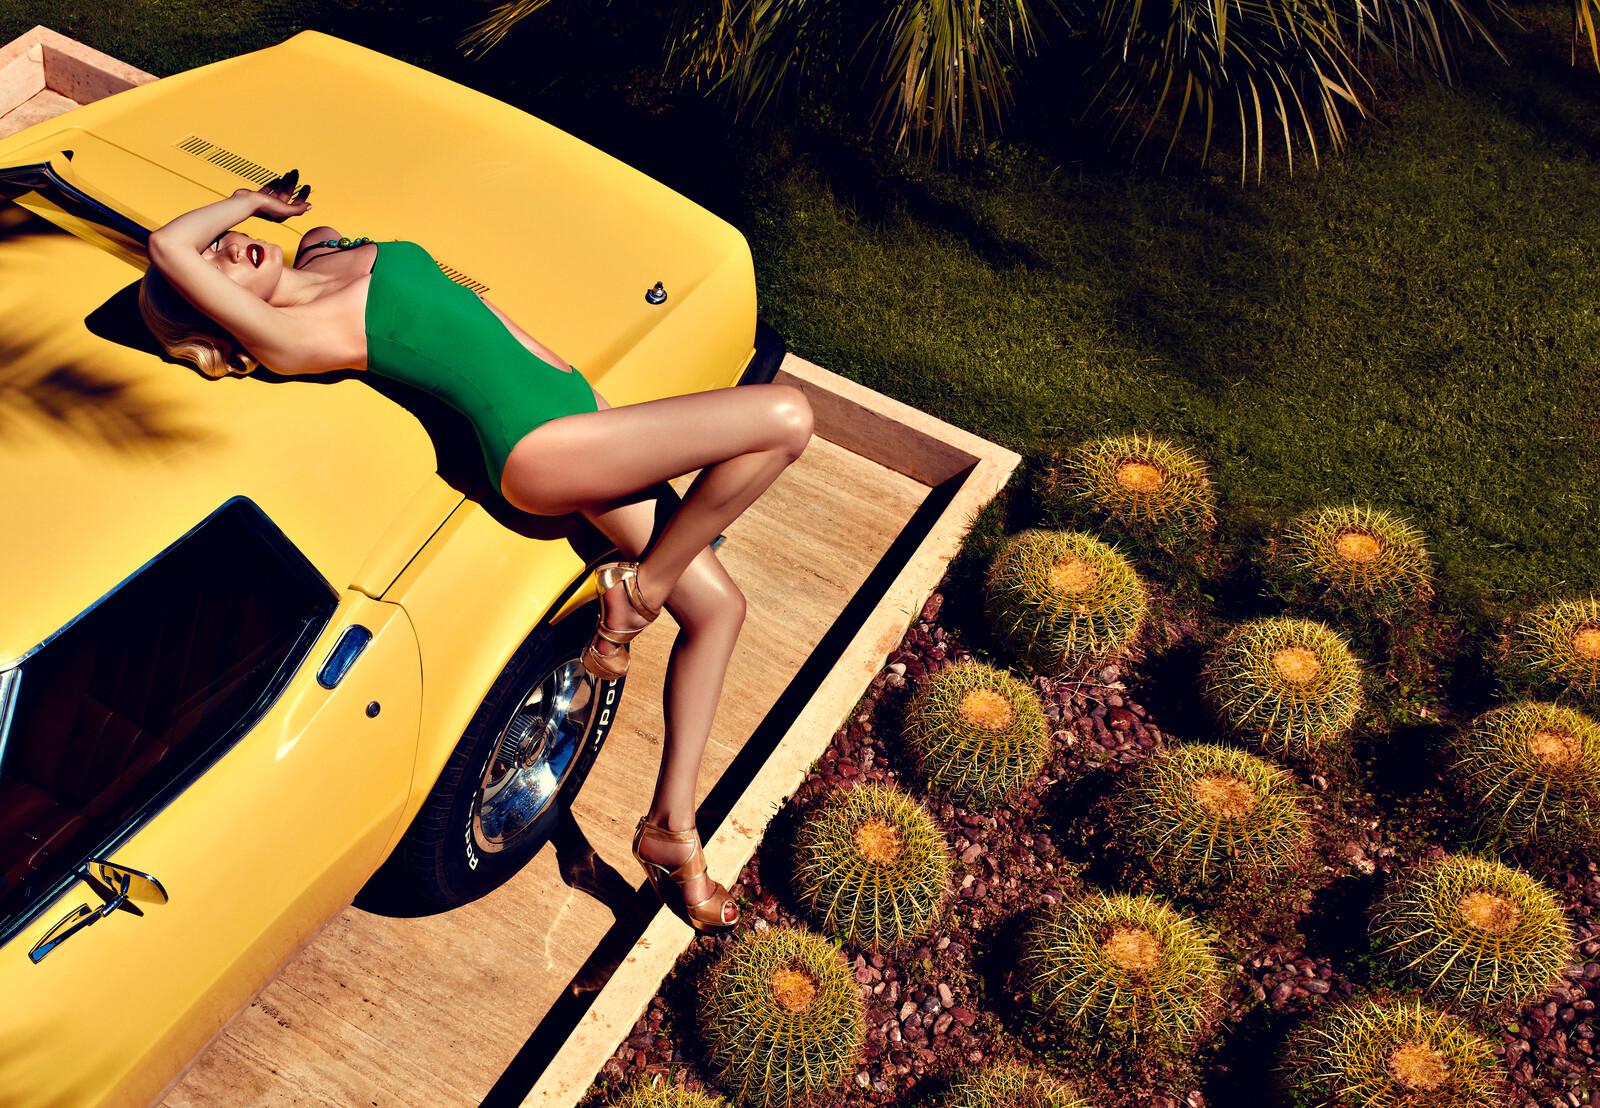 She's got a mango in the garden - Emre Guven